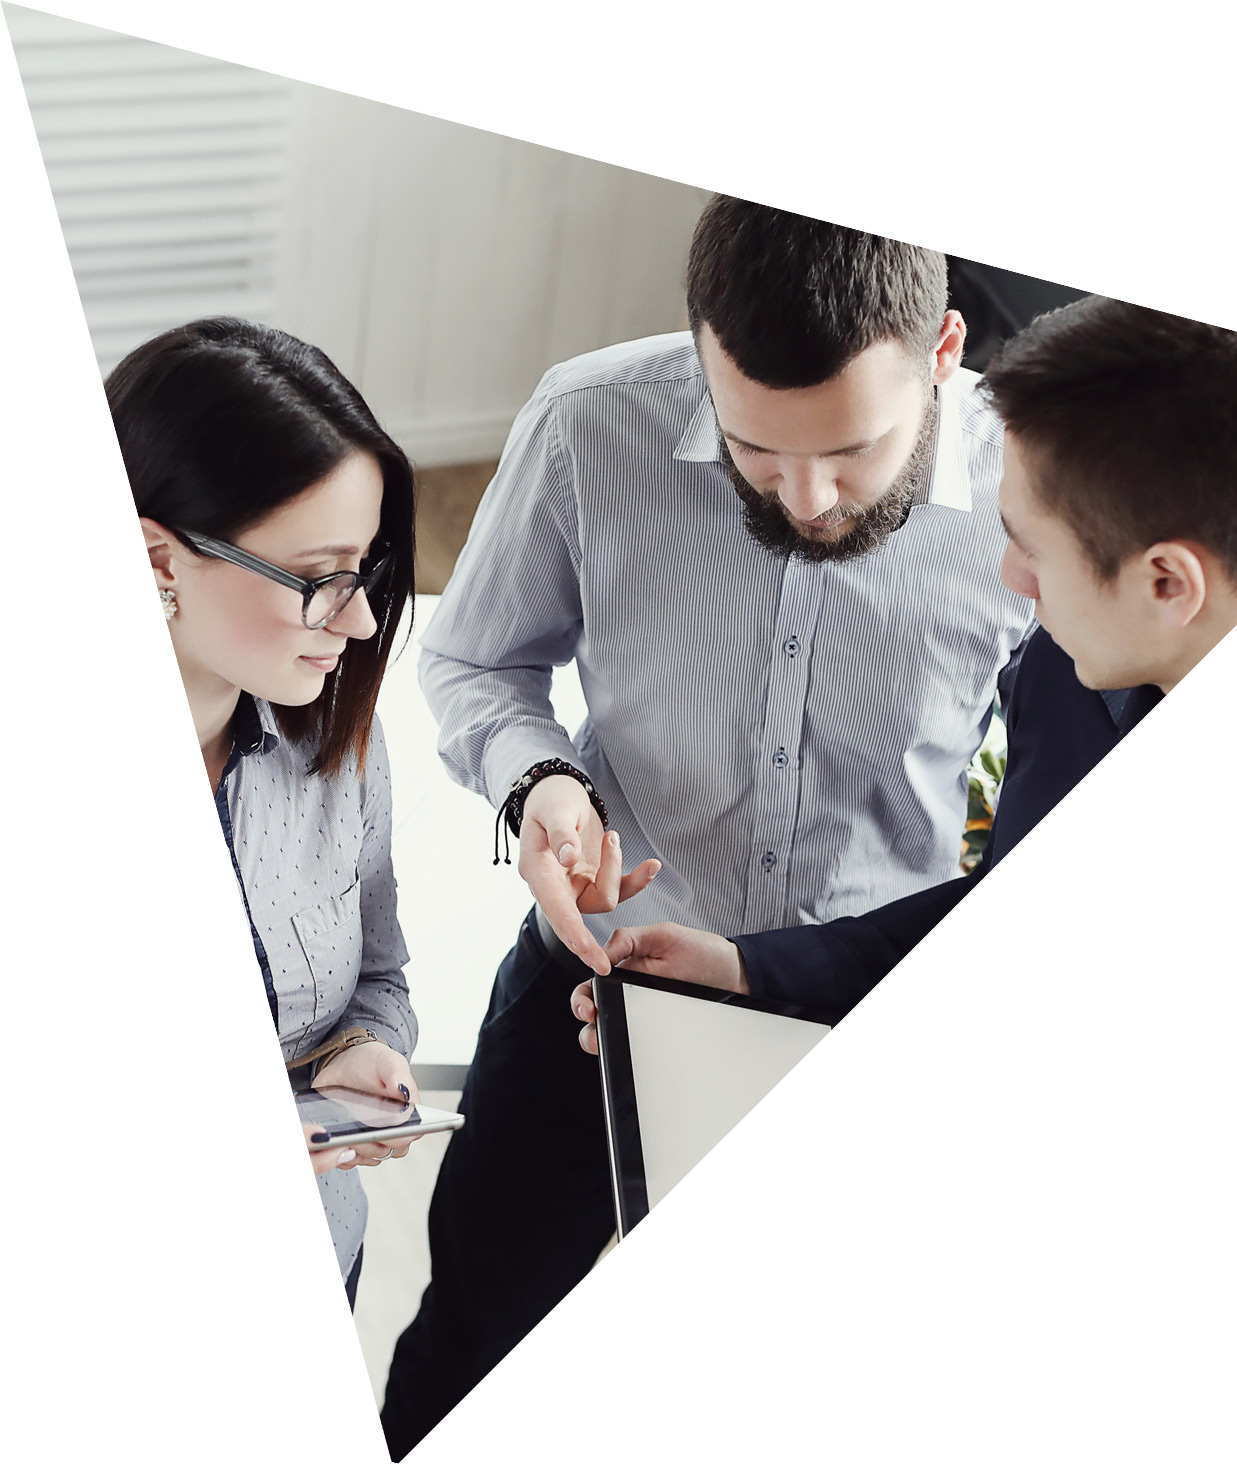 http://www.sissi.fvg.it/wp-content/uploads/2020/11/coaching-businessplan.jpg